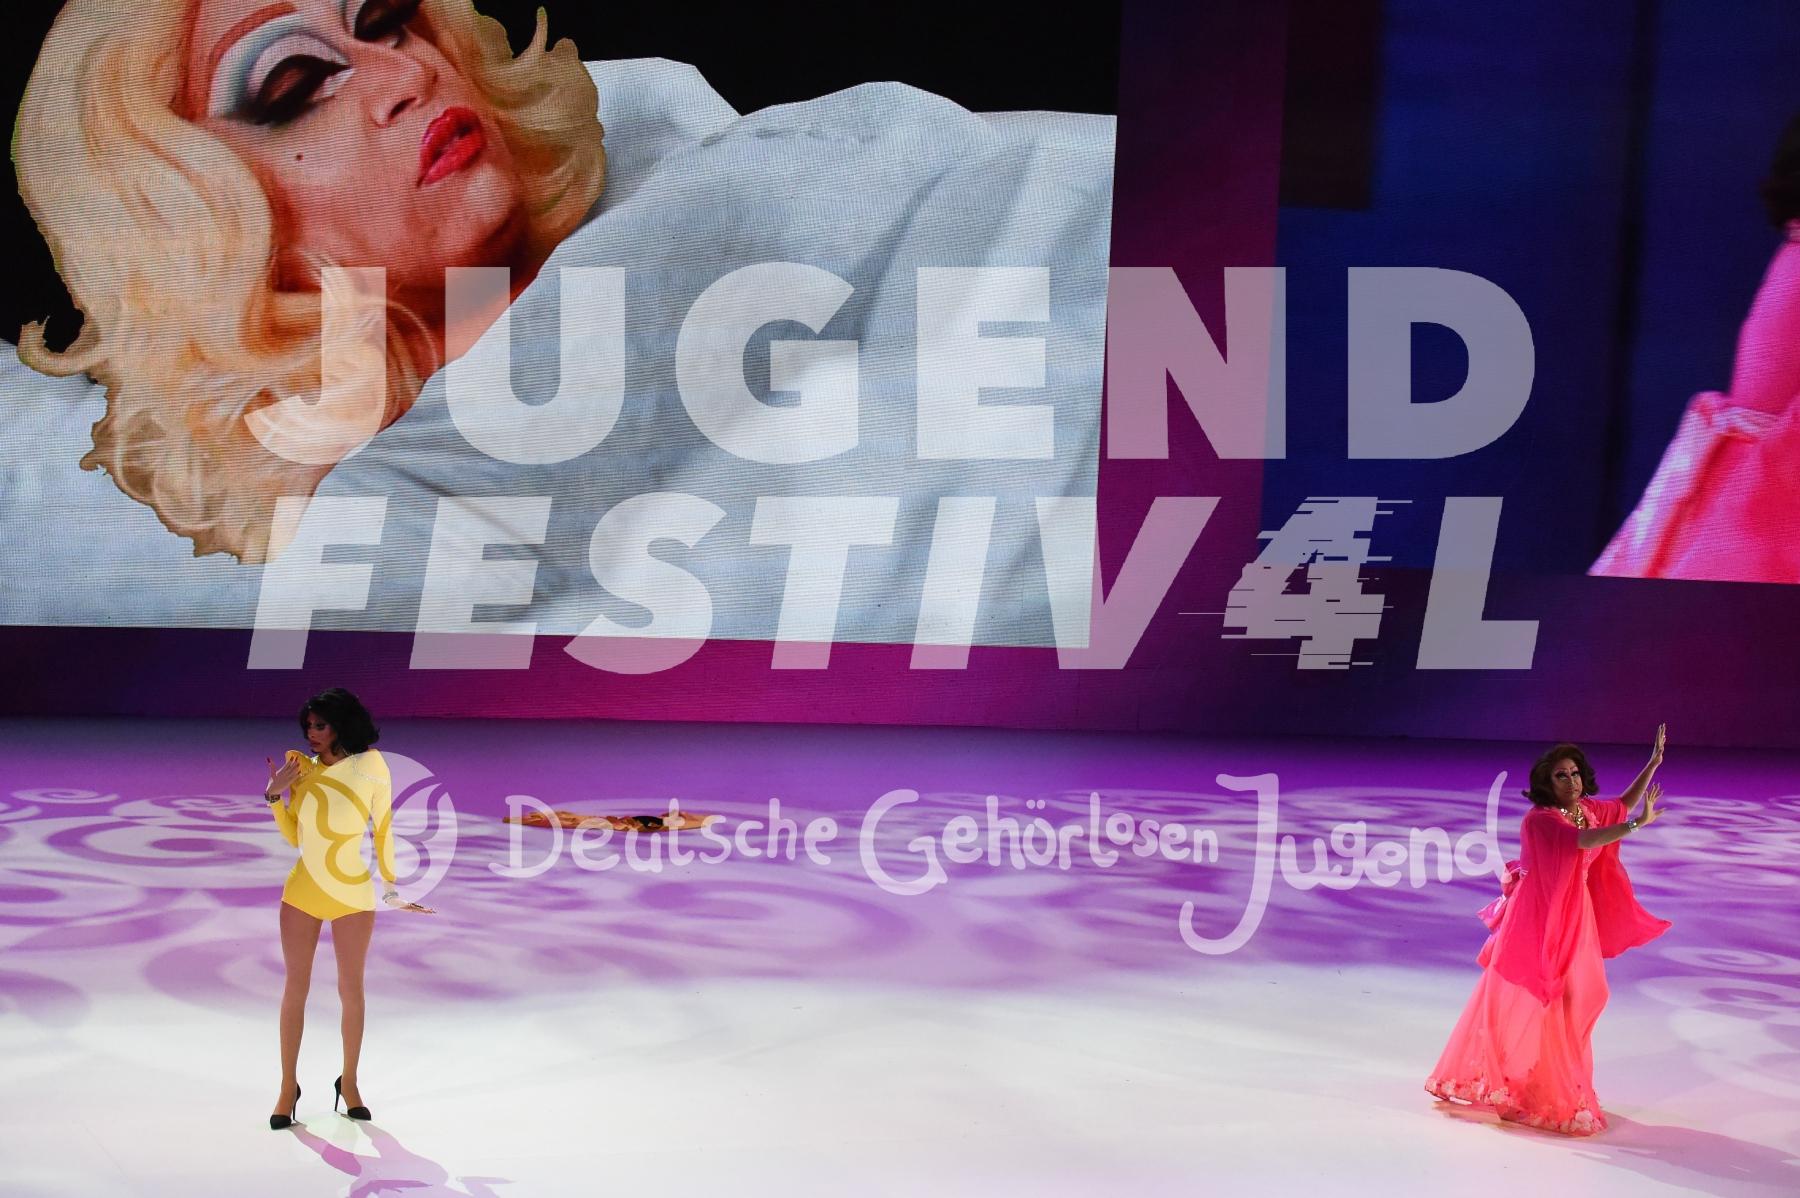 Jugendfestiv4l-170